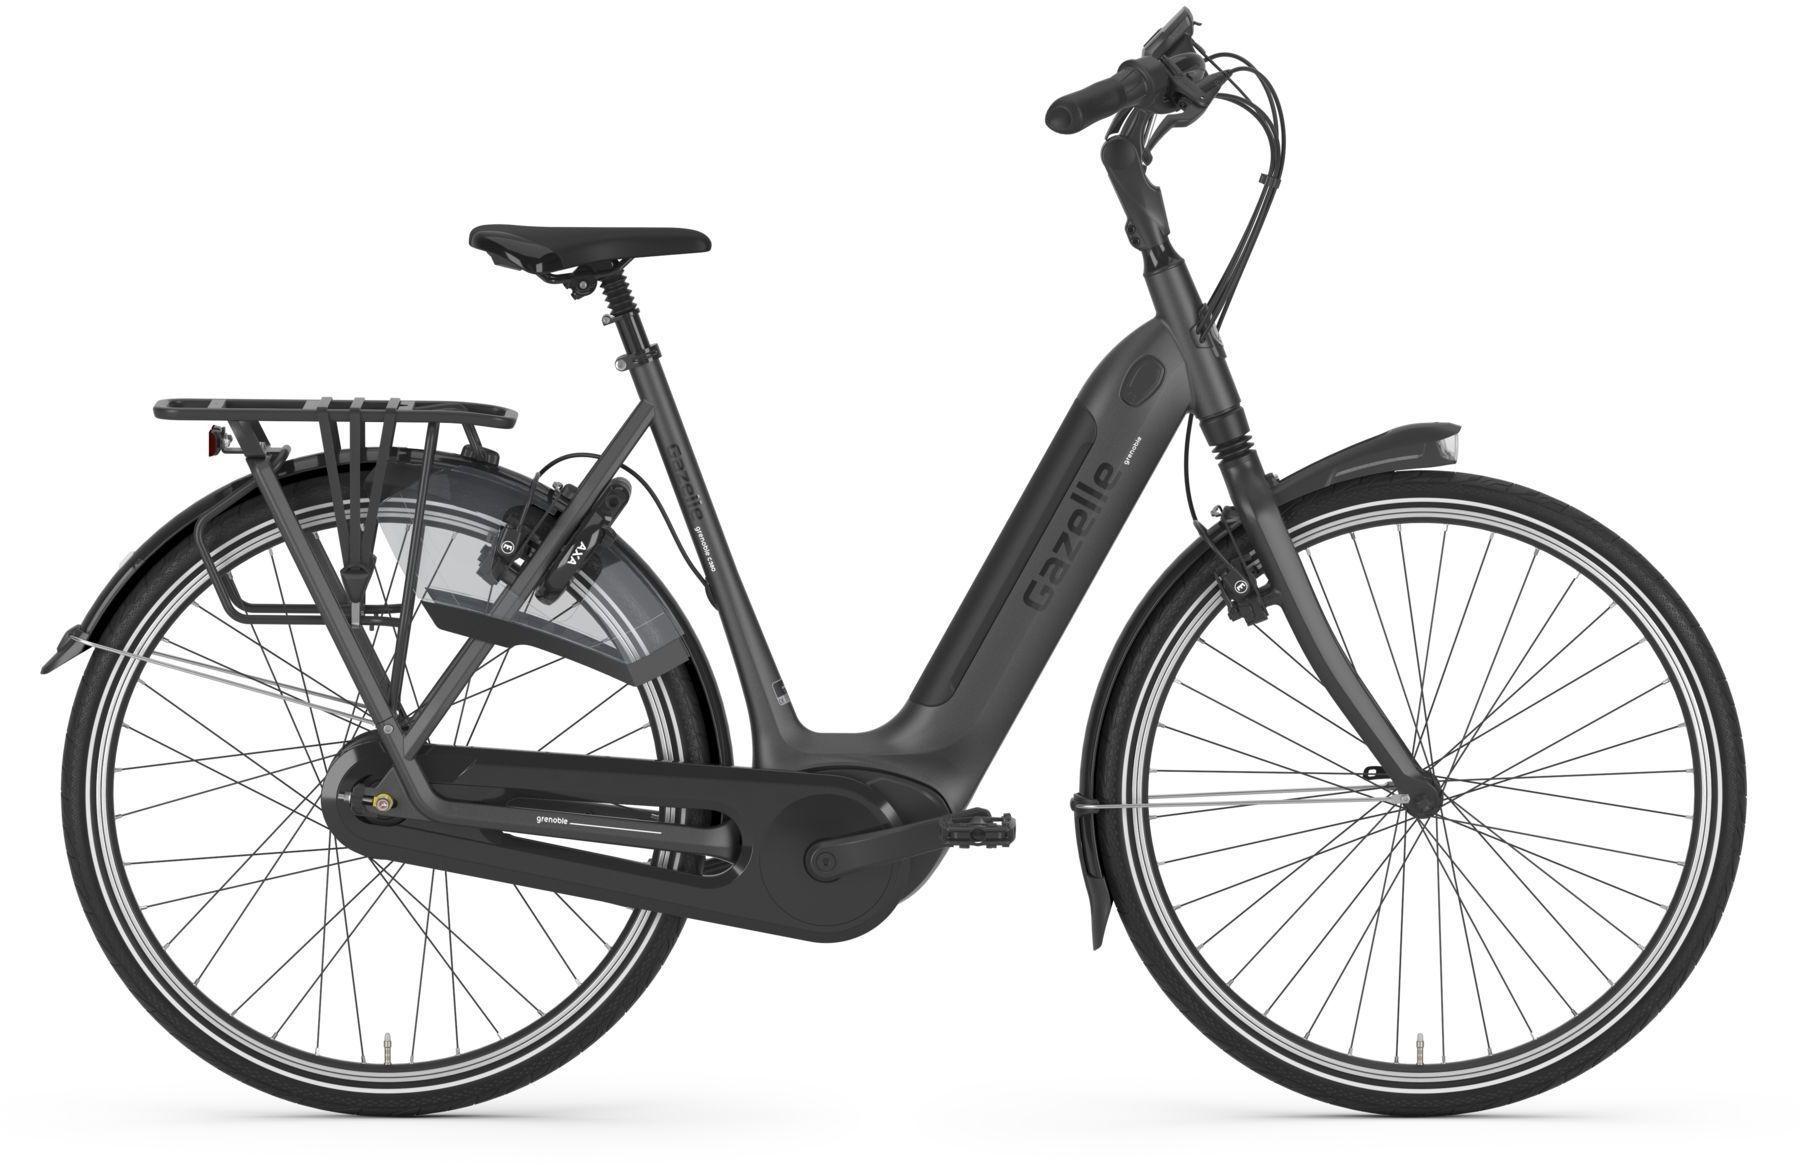 E-Bikes: Gazelle  GRENOBLE C380 HMB (500 Wh) Nabenschaltung Damenfahrrad Tiefeinsteiger Modell 2021 28 Zoll 61 cm